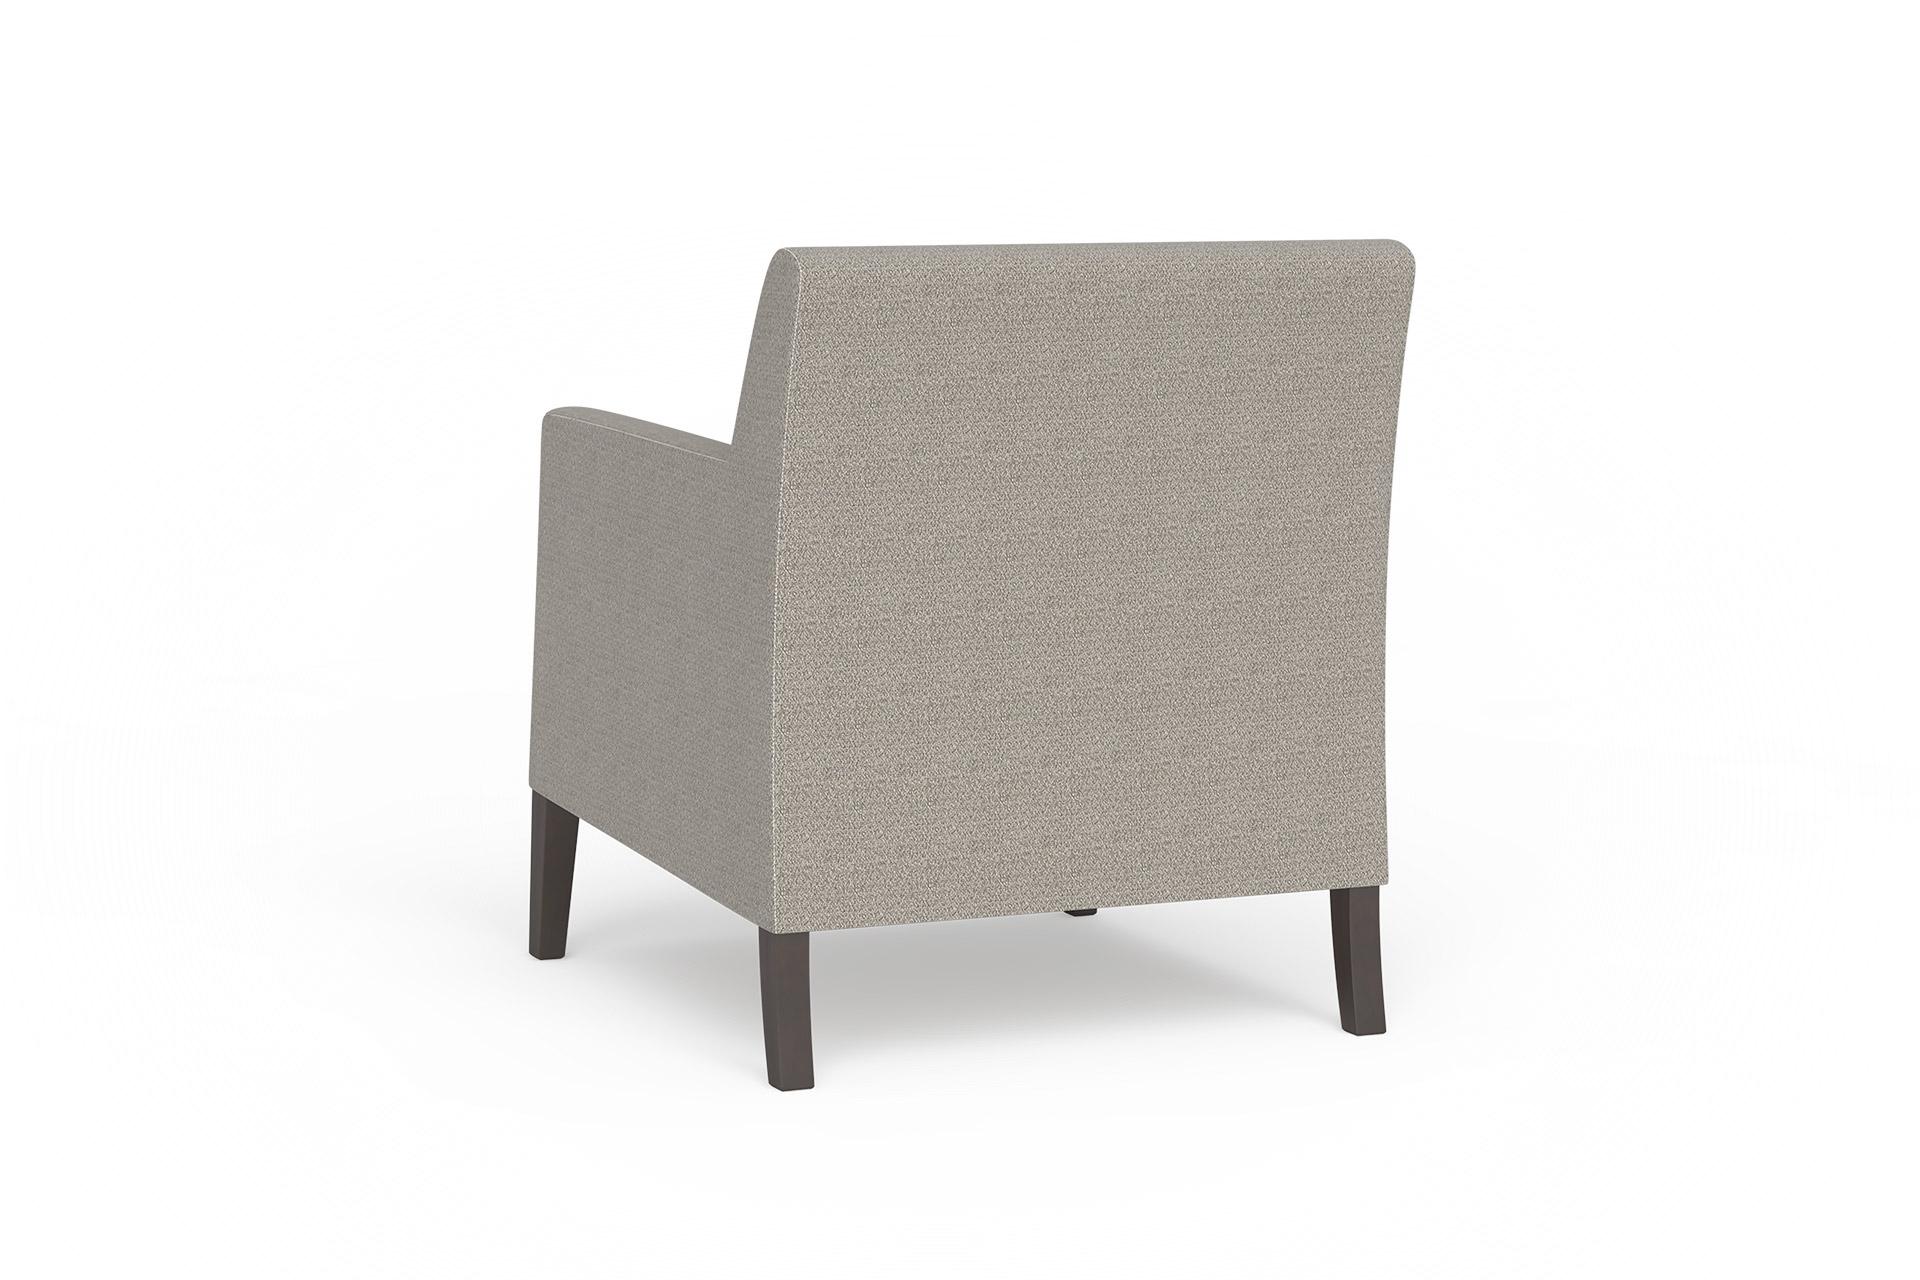 loft-and-manor-york-chair-3